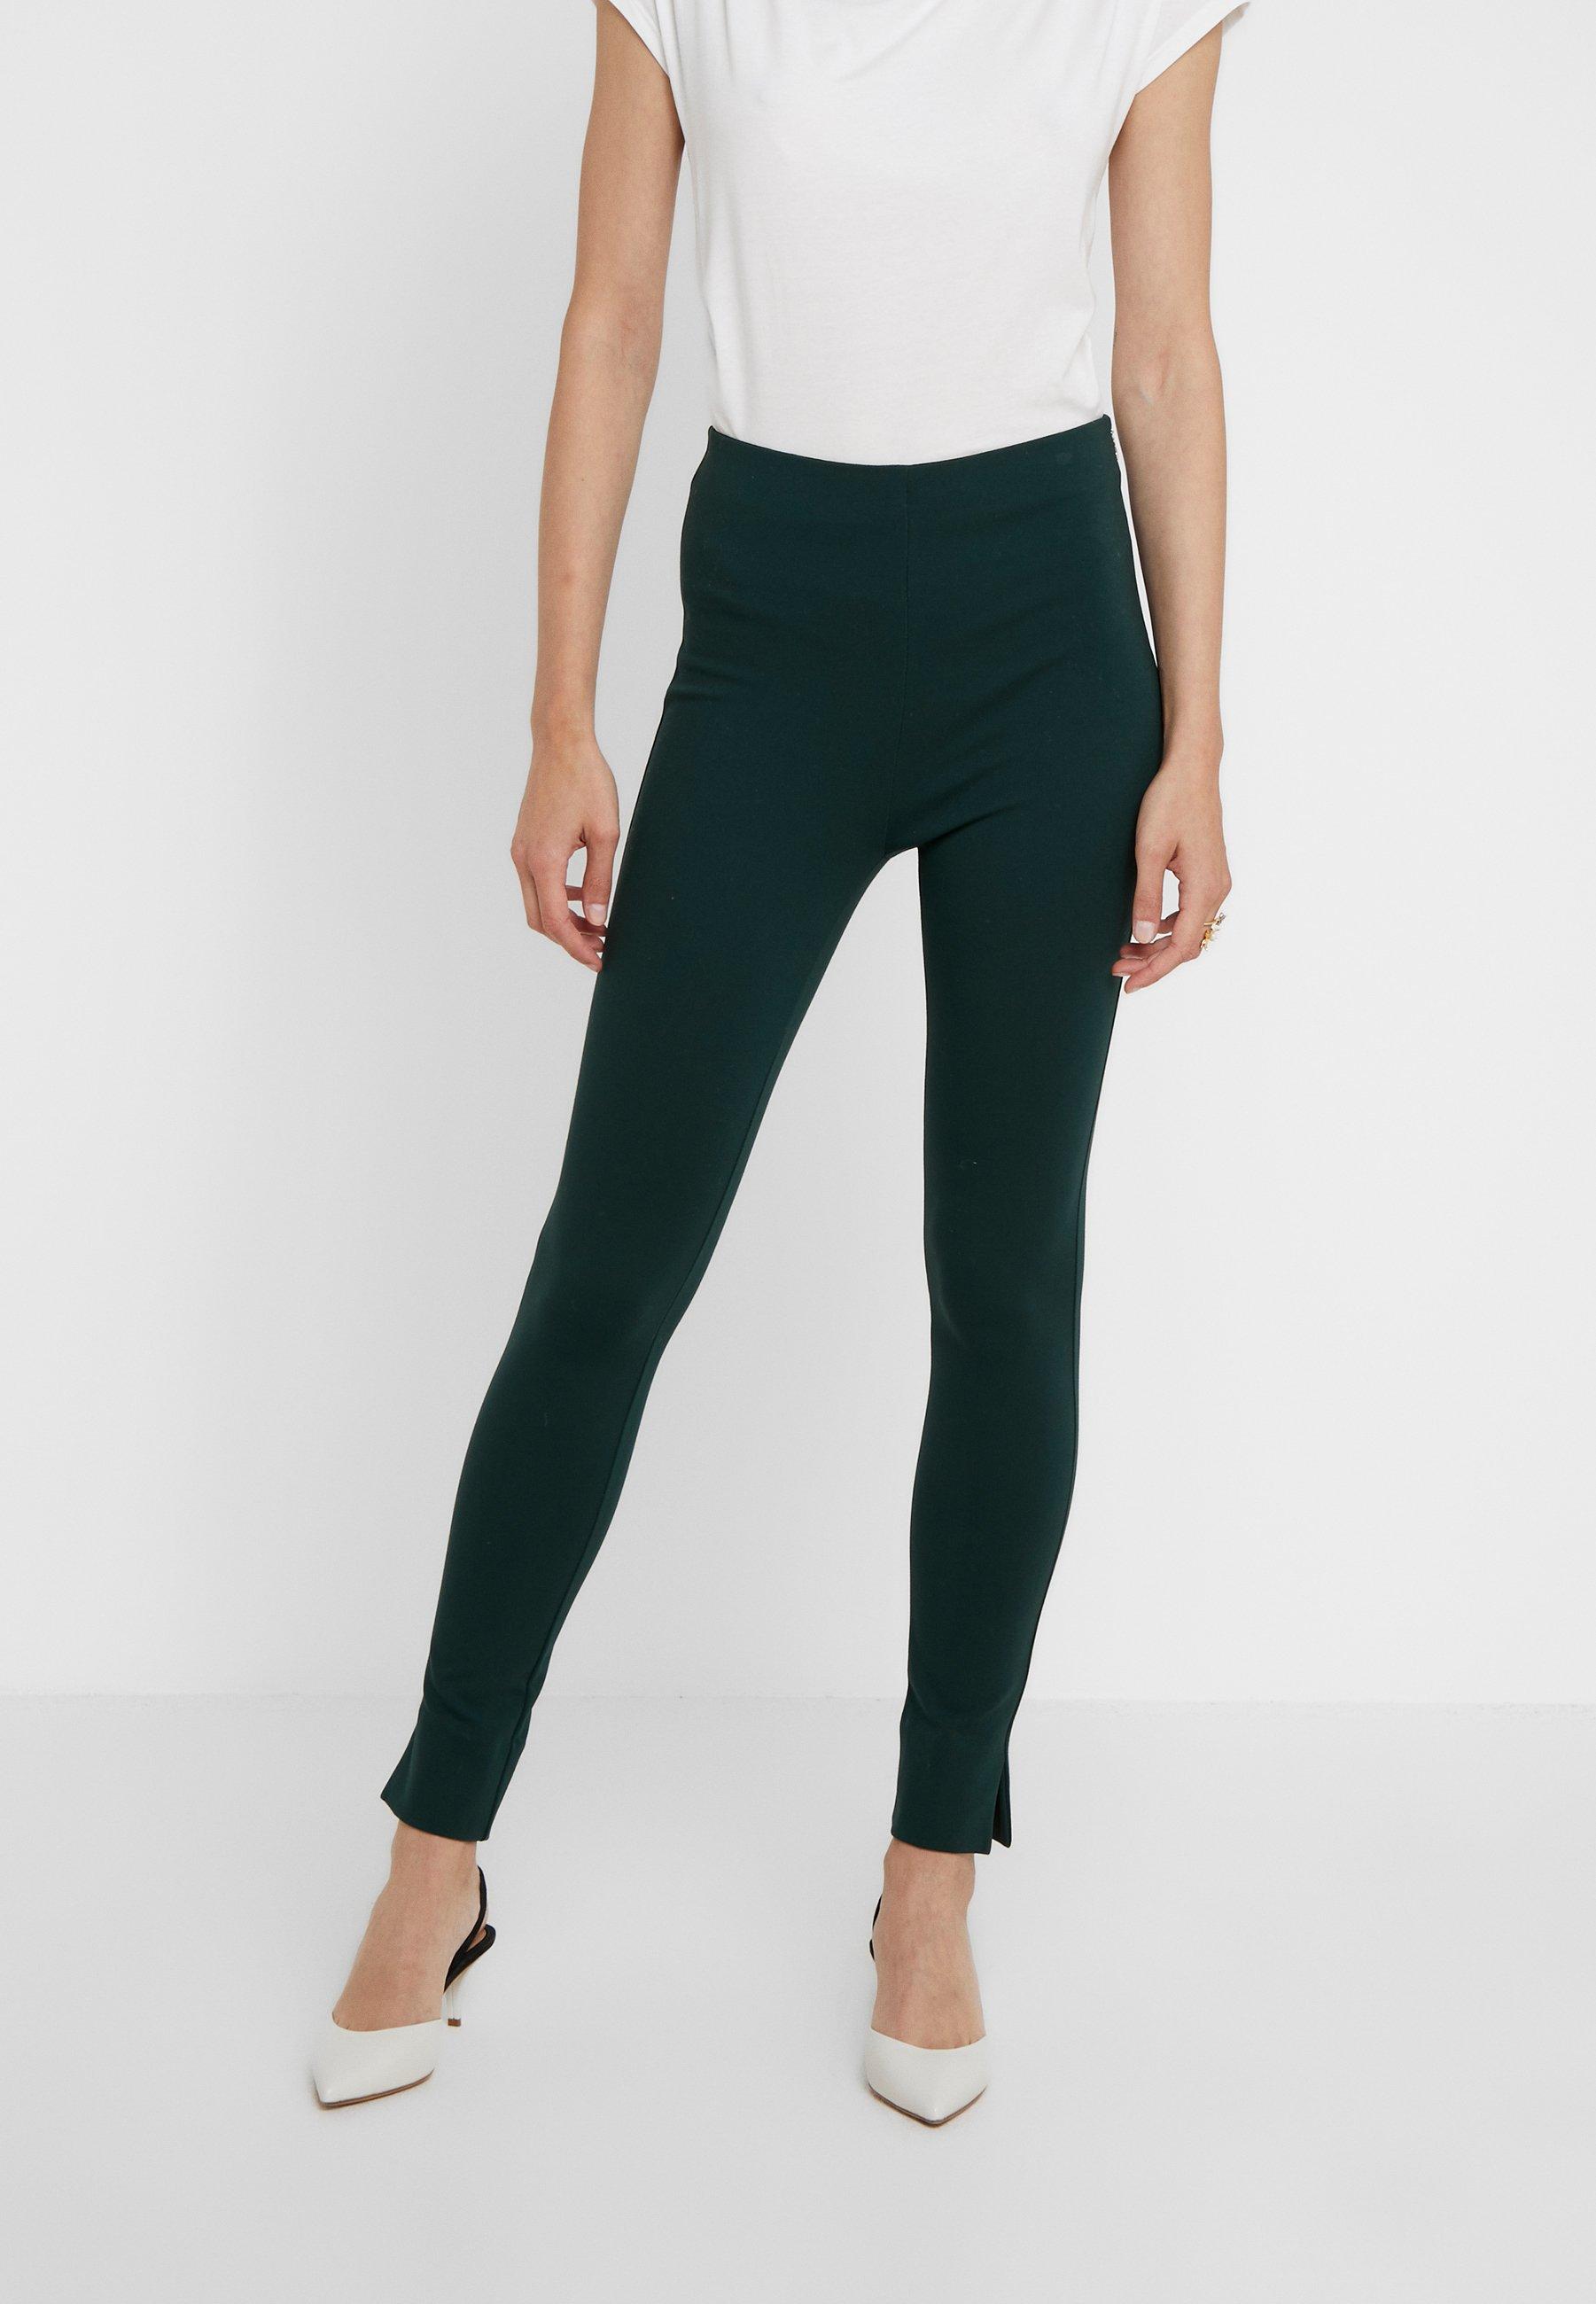 TrousersLegging Green Patrizia Pepe Pantaloni Dark ZTlwOuXPki